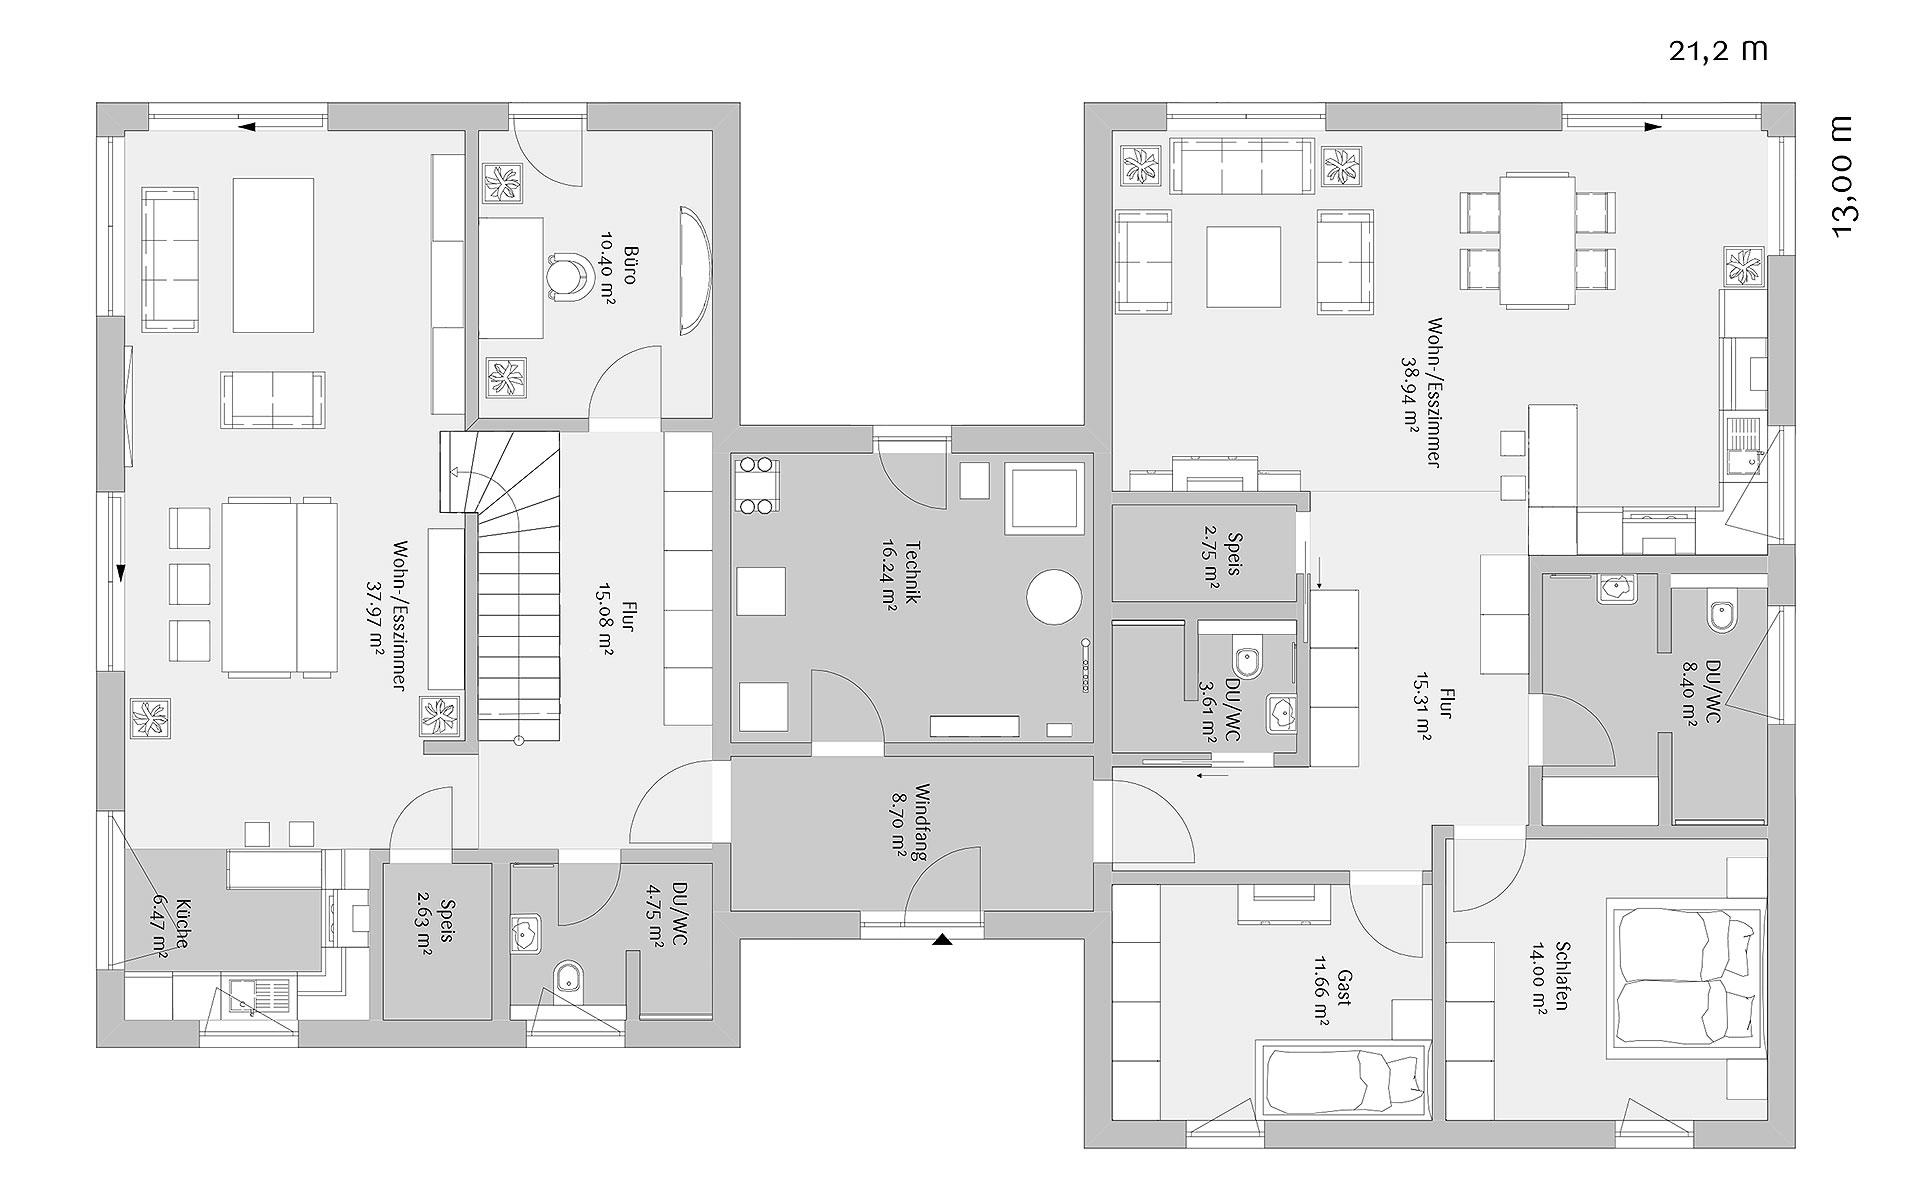 Erdgeschoss Modern 263 von FischerHaus GmbH & Co. KG